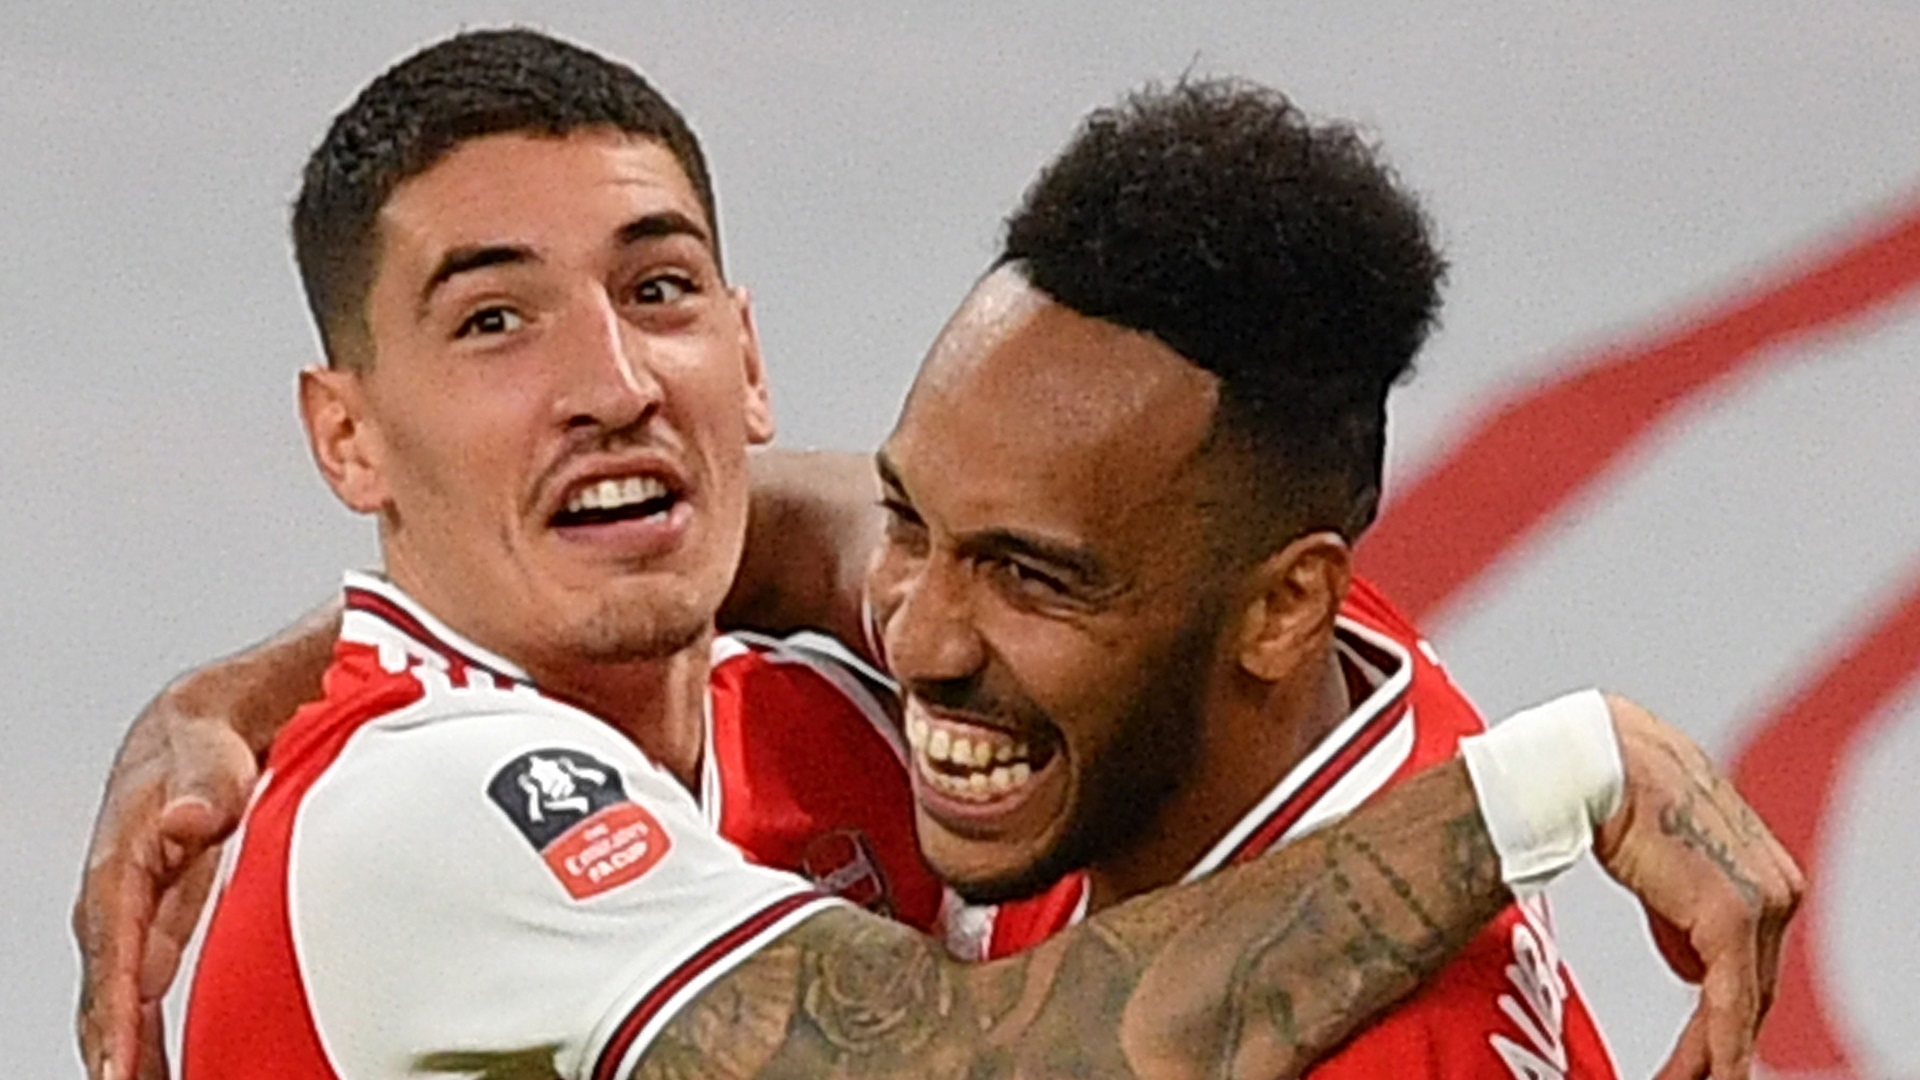 Man Utd hero Ferdinand: Oblak only one to replace De Gea